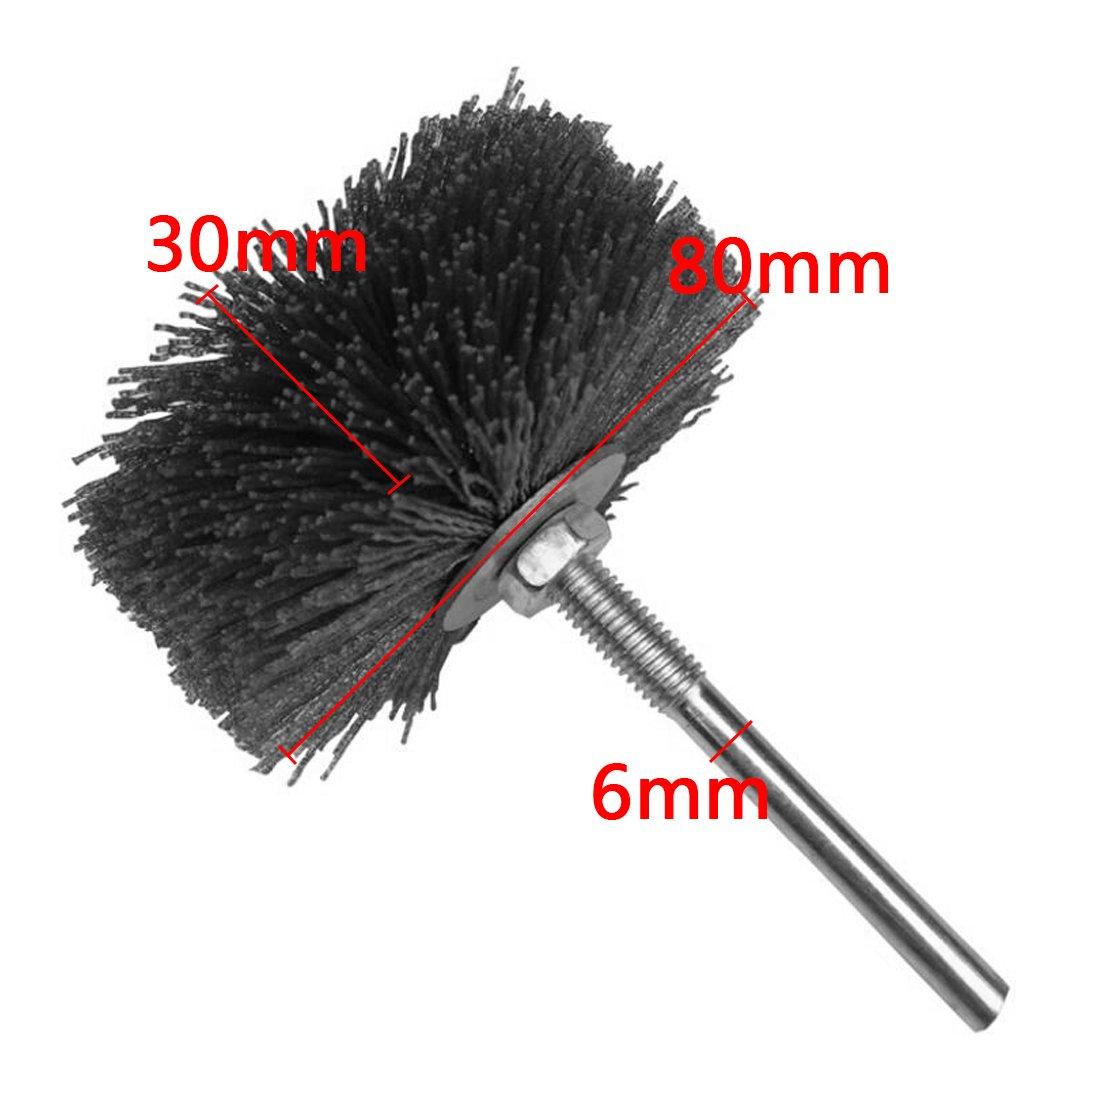 Abrasive Nylon Rad Pinsel Radial Polierb/ürste f/ür Holz M/öbel Mahagoni Finishing Metall Stein ODOD85mm 1 St/ück Schwarz 120#